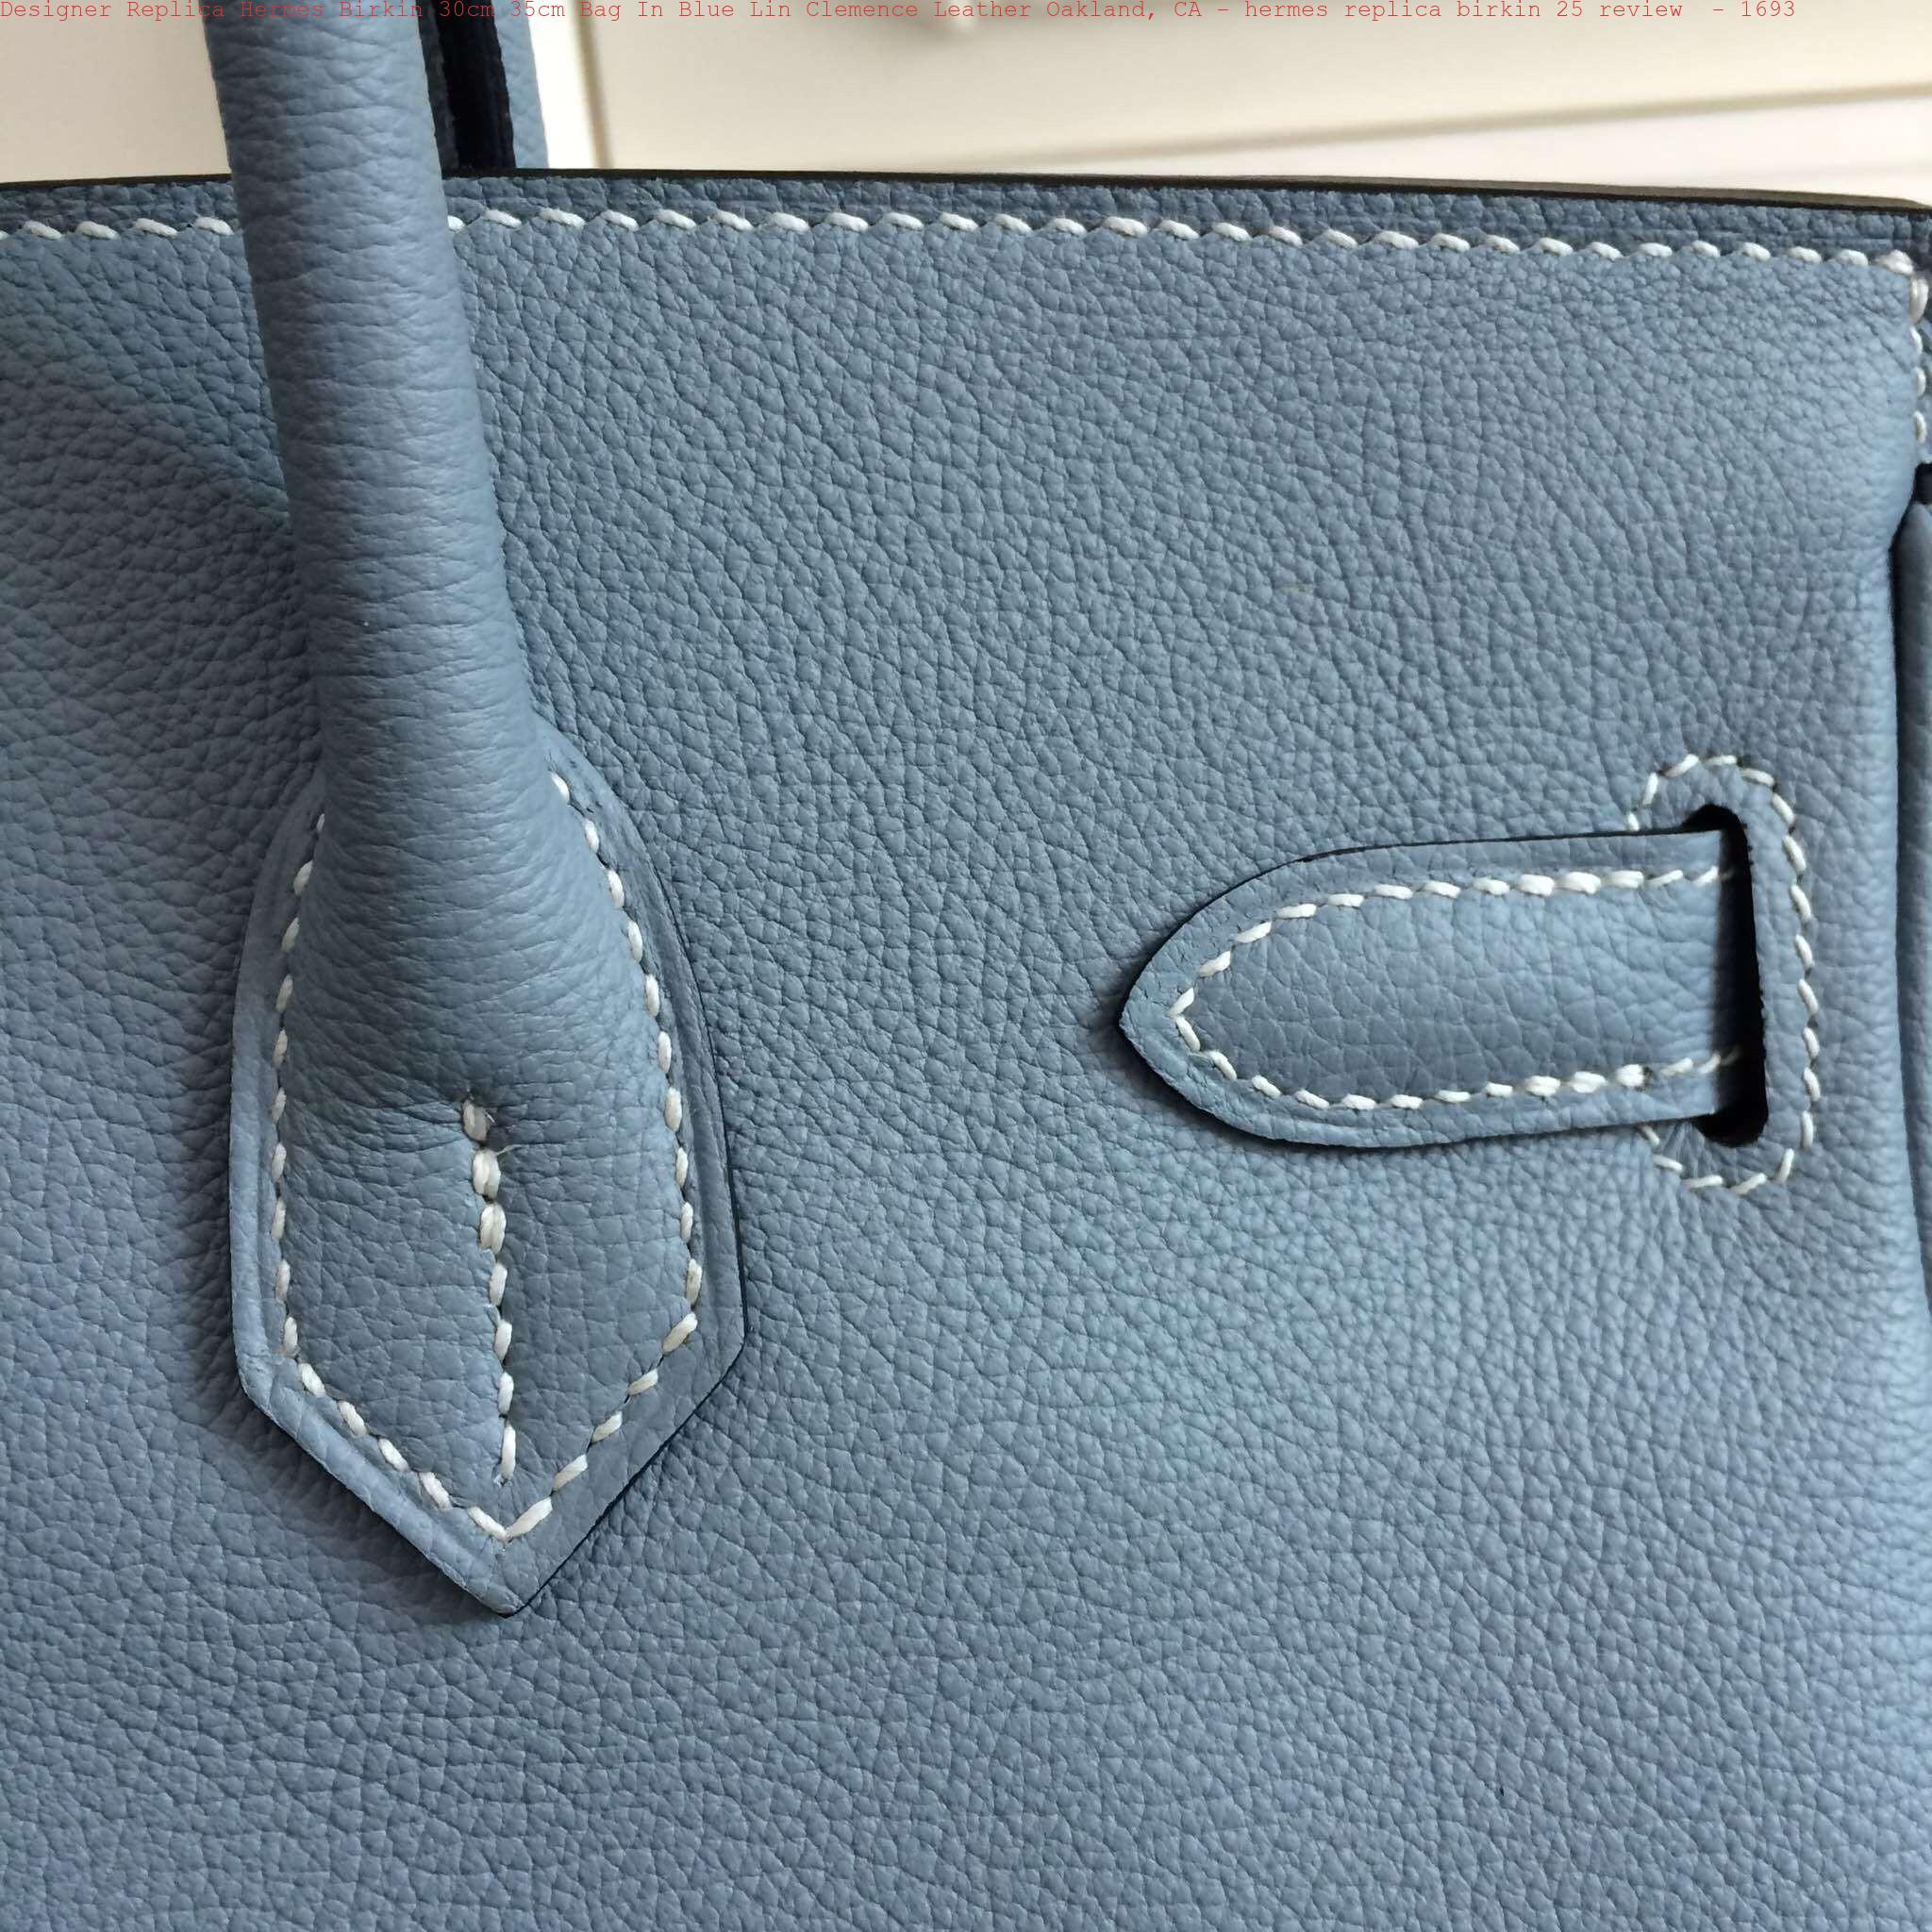 Designer Replica Hermes Birkin 30cm 35cm Bag In Blue Lin Clemence ... 4e8affc533b06